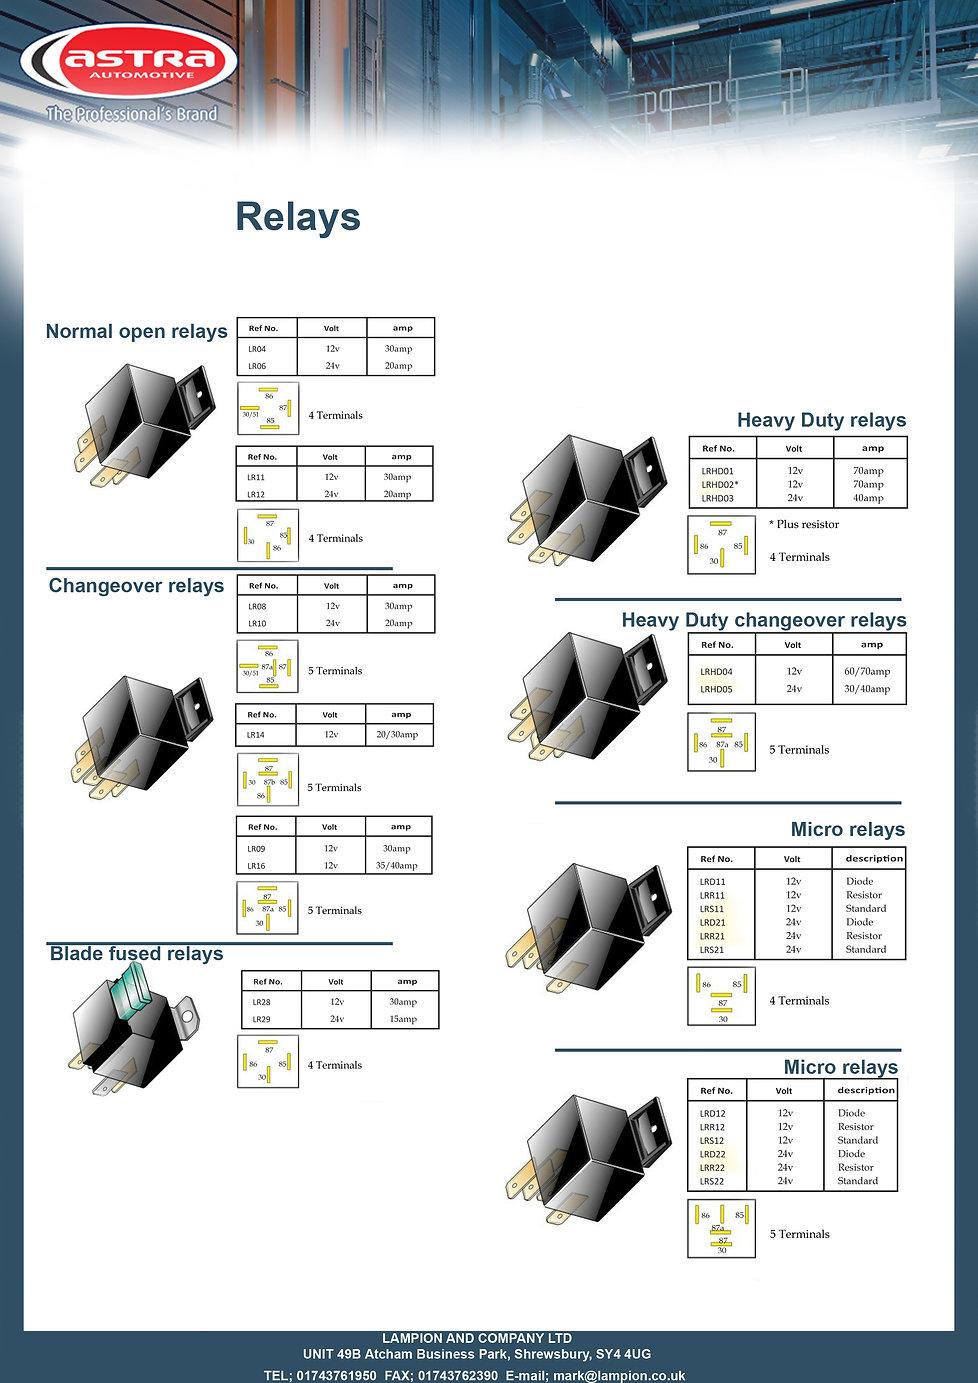 Relays copy.jpg